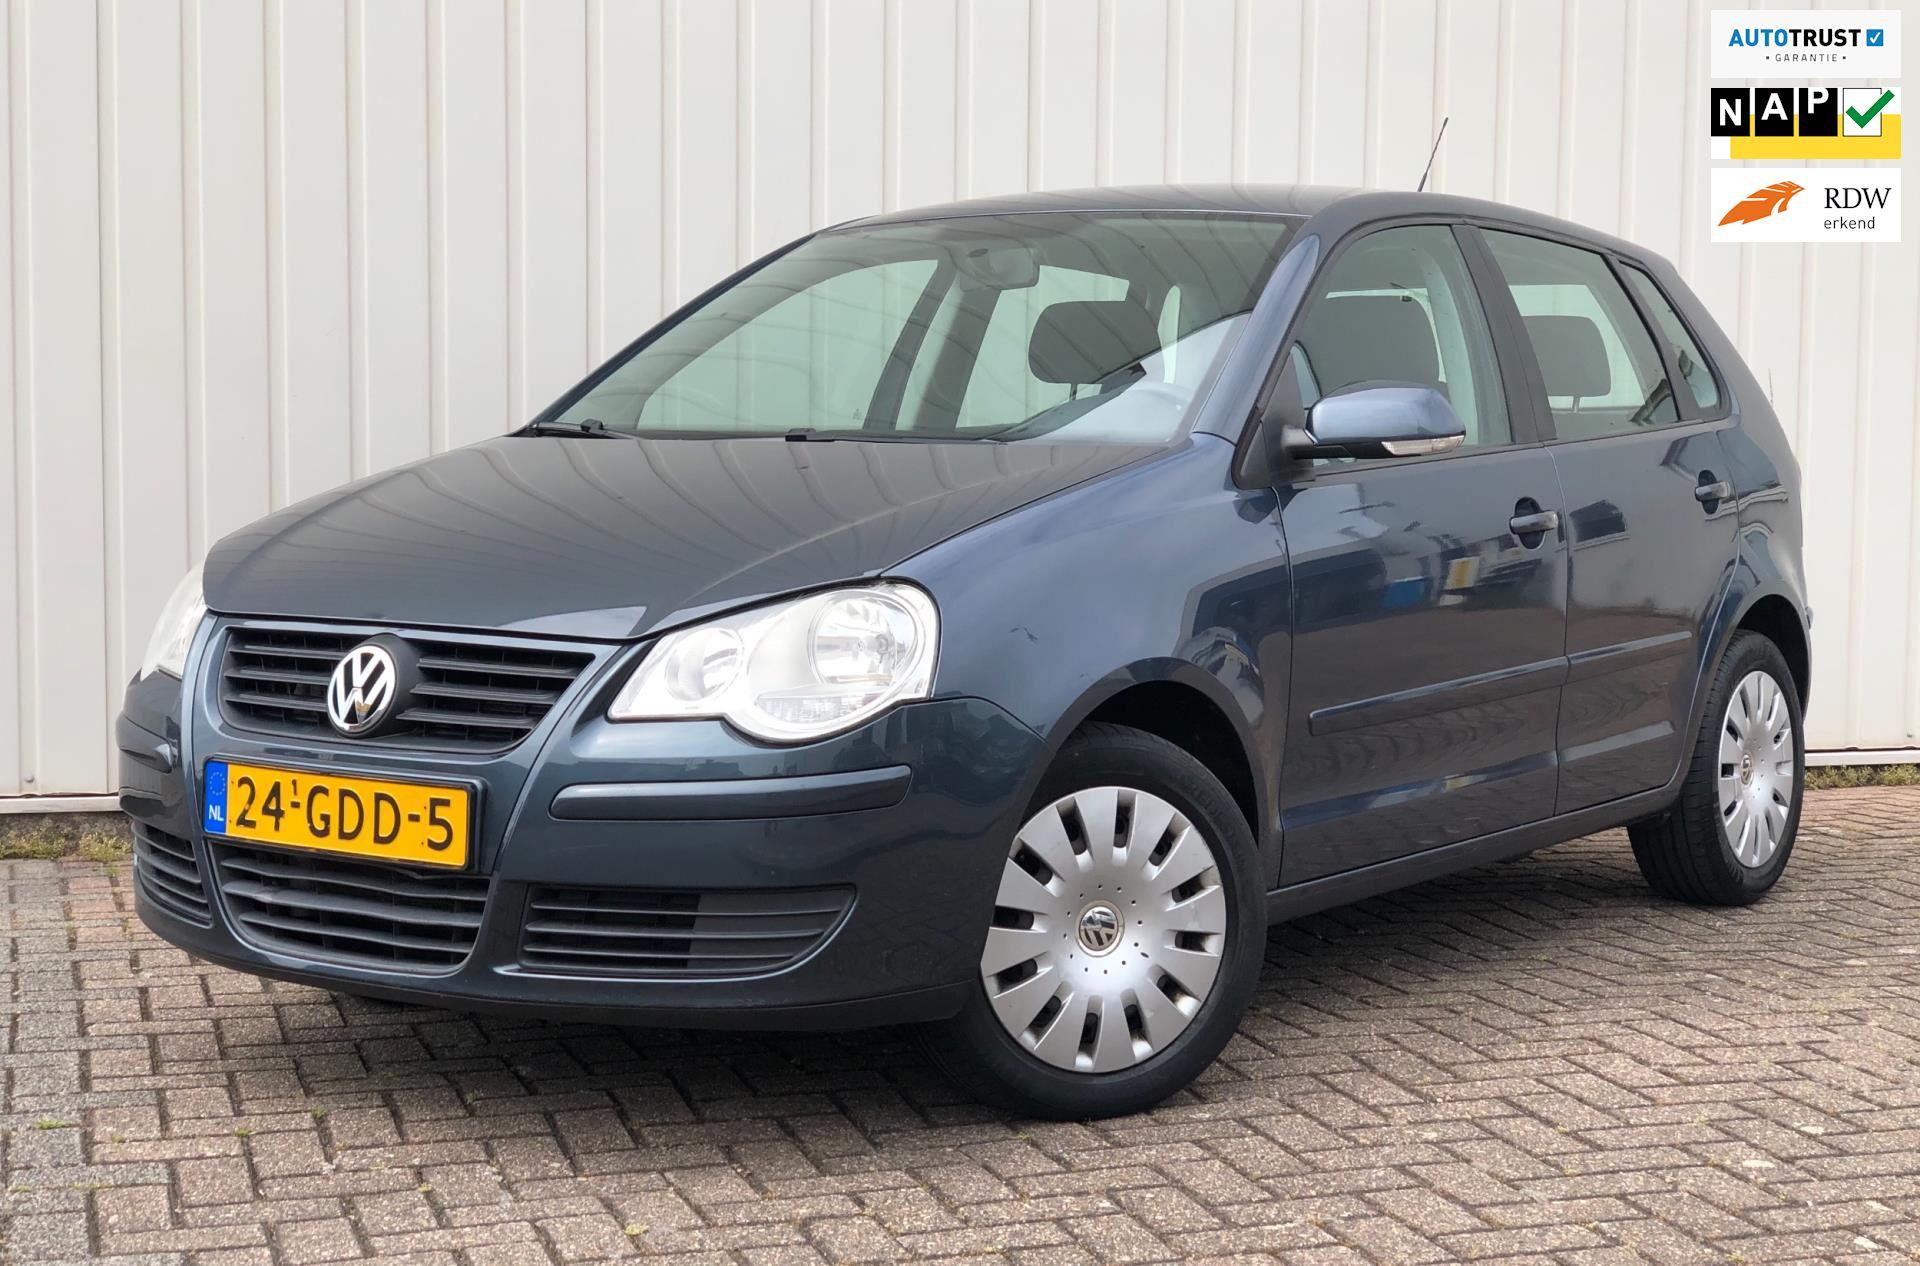 Volkswagen Polo occasion - Heel Holland Rijdt